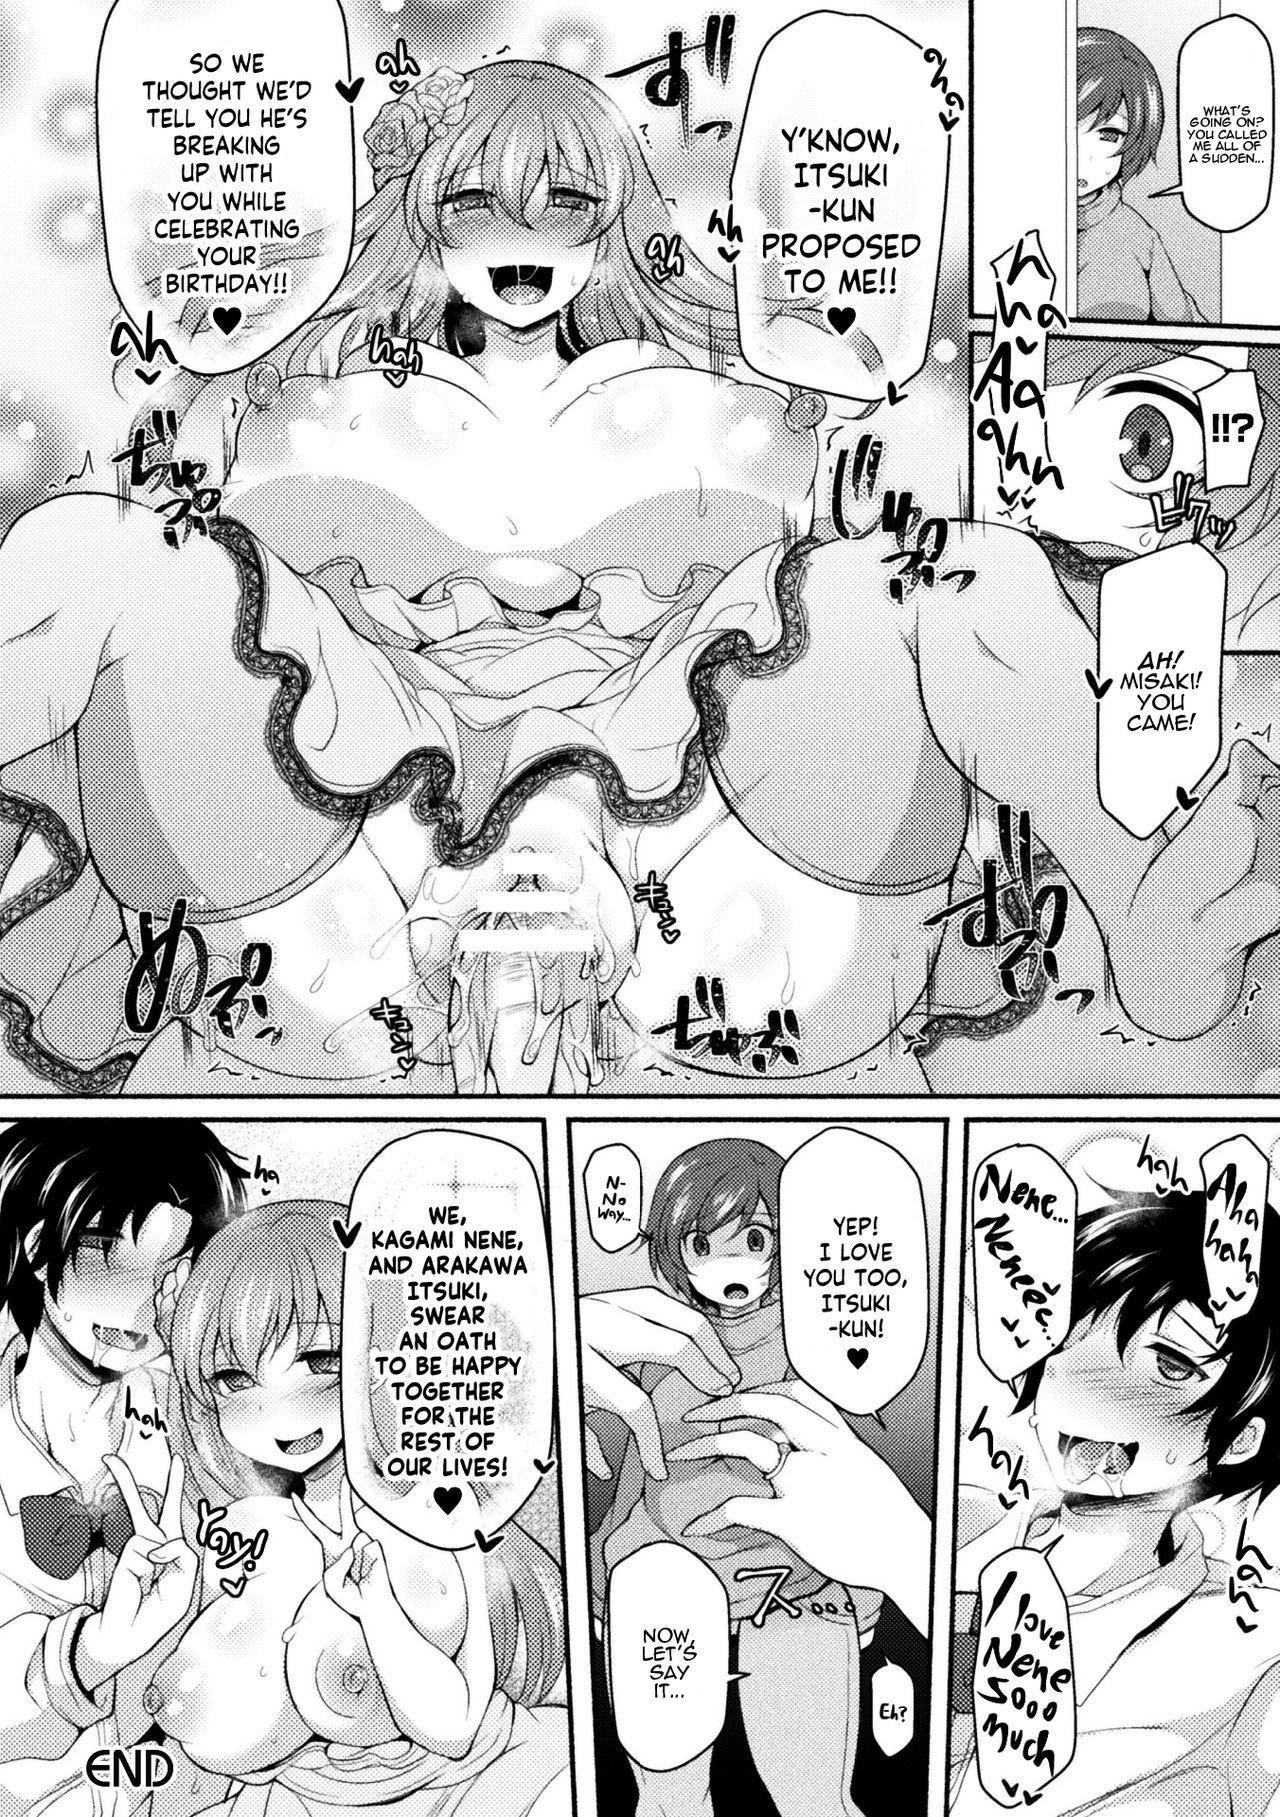 [Jenigata] NTRiage ~Ai o Chikau... Hazu deshita~   NTRiage ~An Oath of Love, or Really?~ [English] [Panatical] [Digital] 29